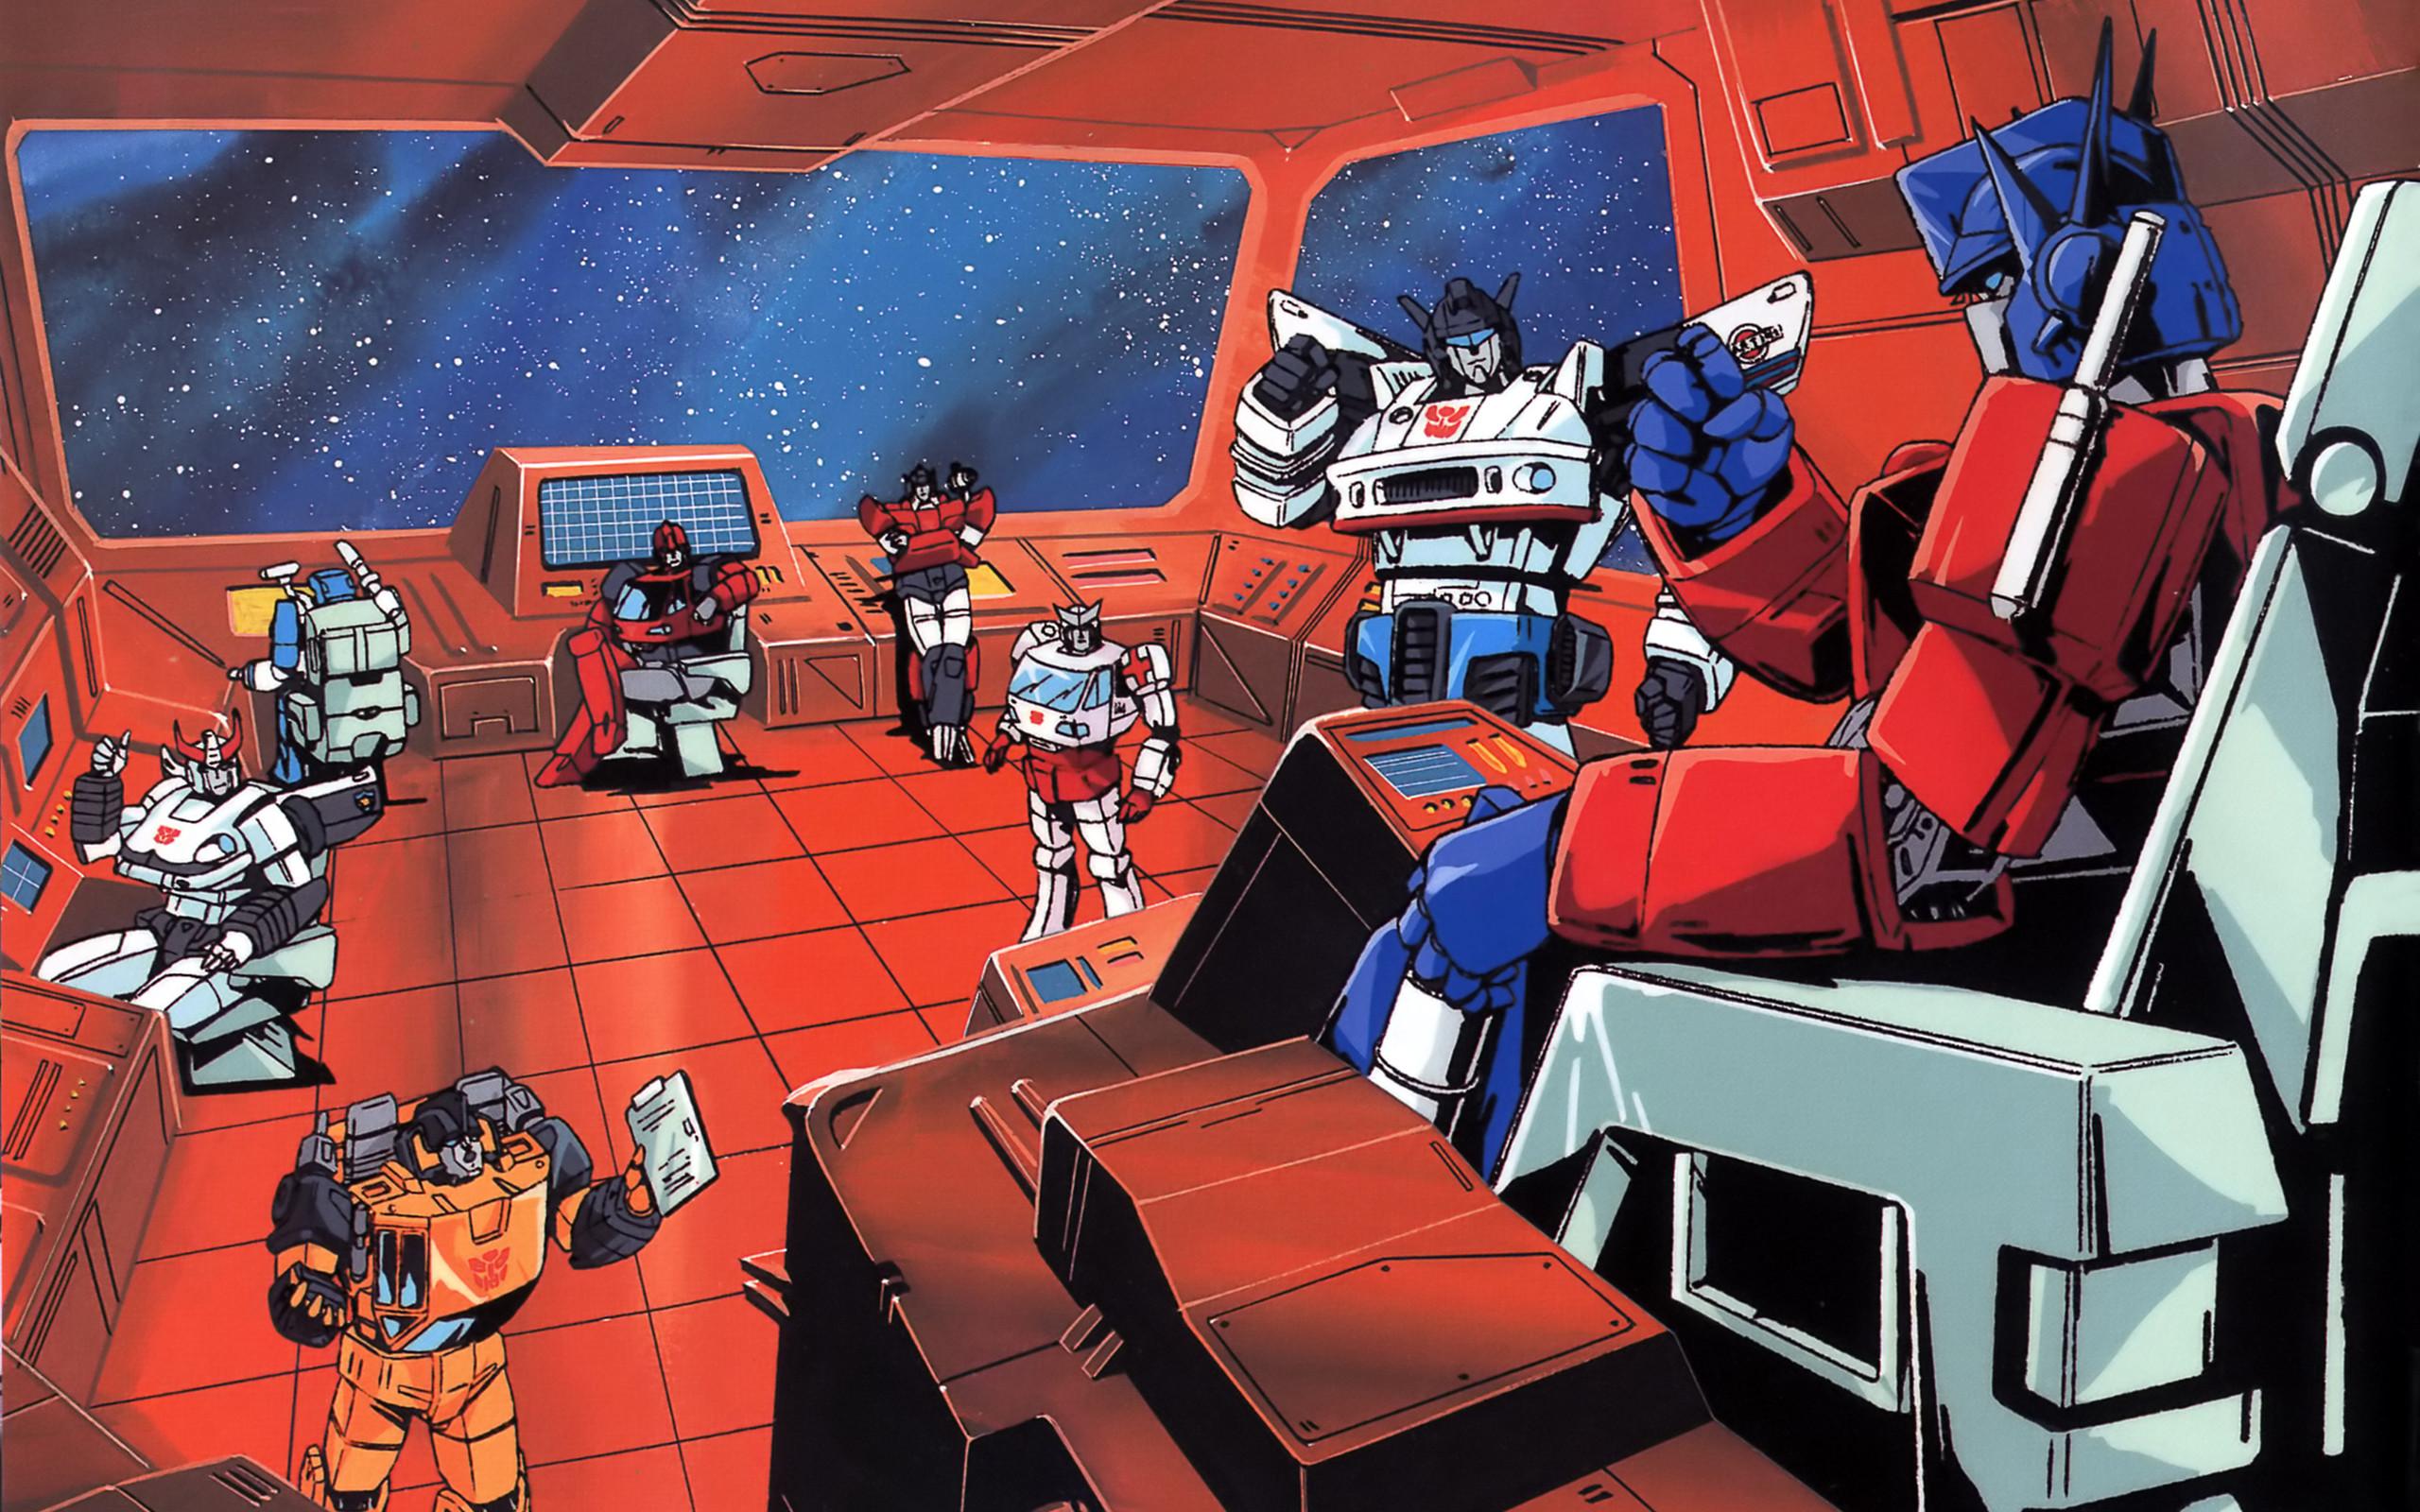 Transformers Fall Of Cybertron Wallpaper Hd Transformers G1 Series Optimus Prime And Grimlock Wallpaper 183 ①